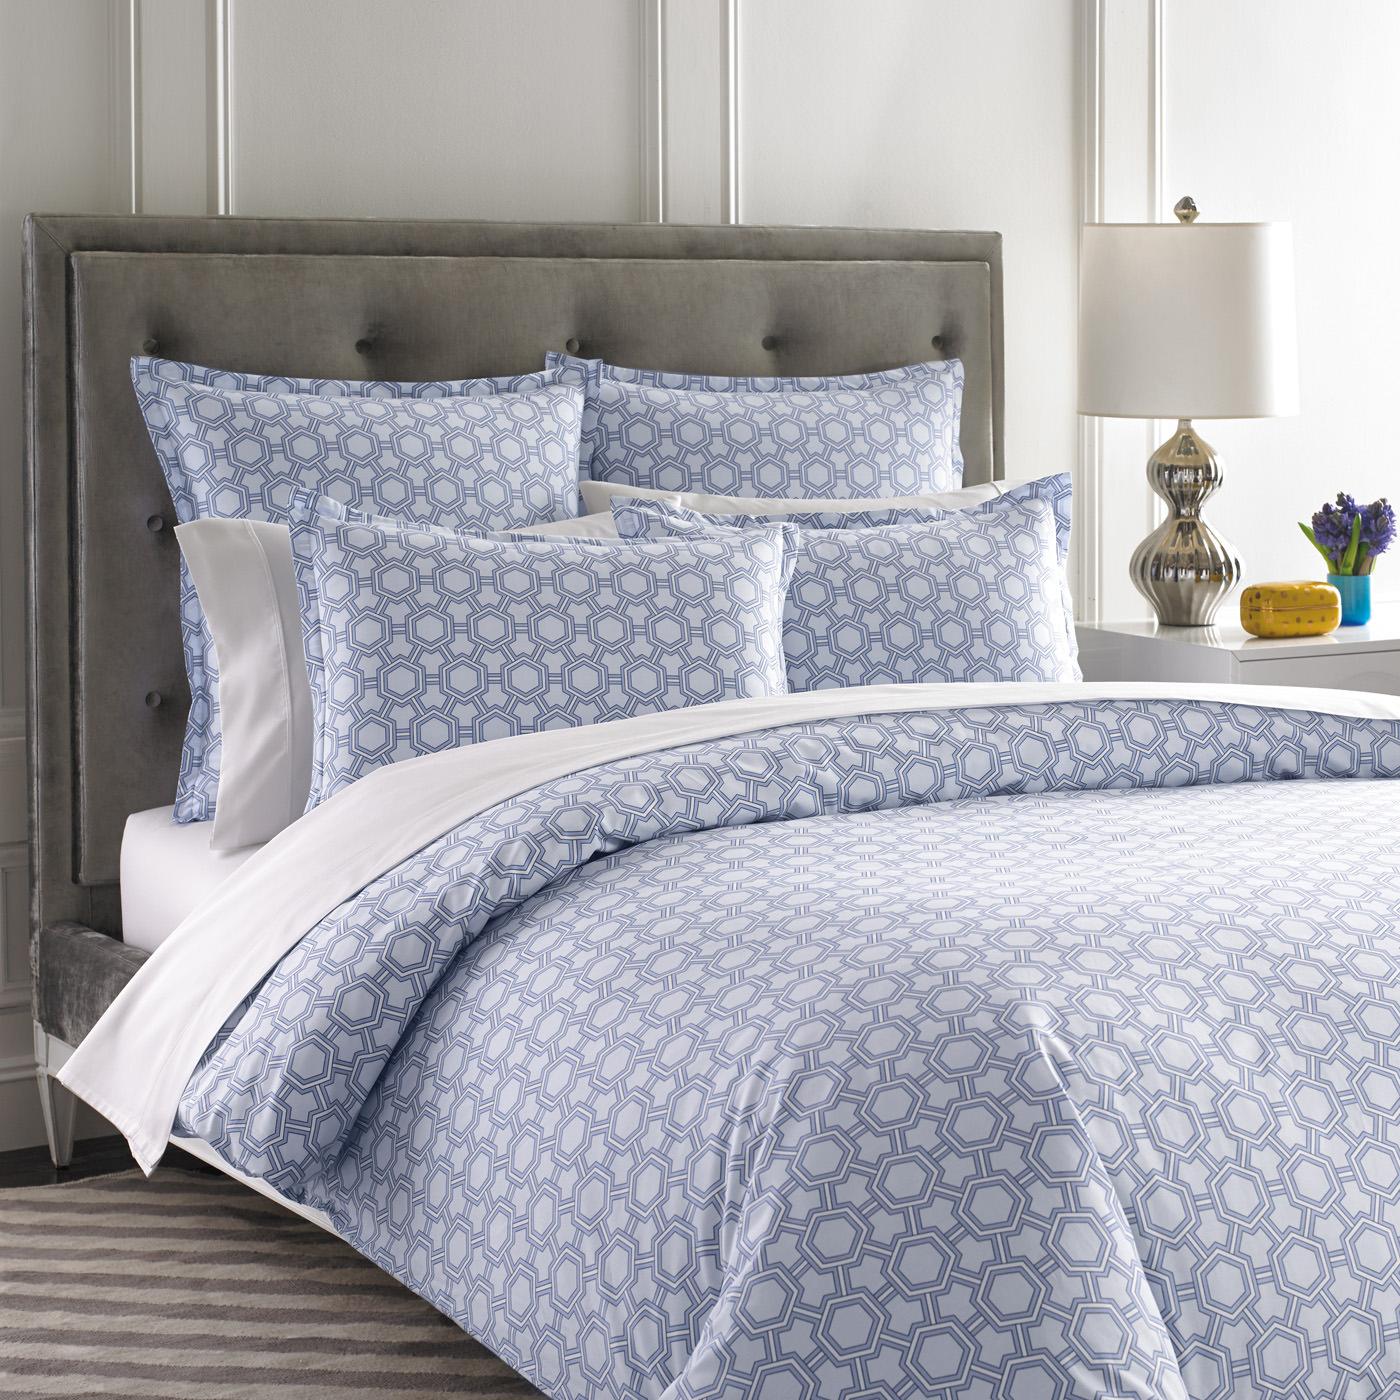 Jonathan Adler Bedding Sets for Chic Bedrooms - HomesFeed